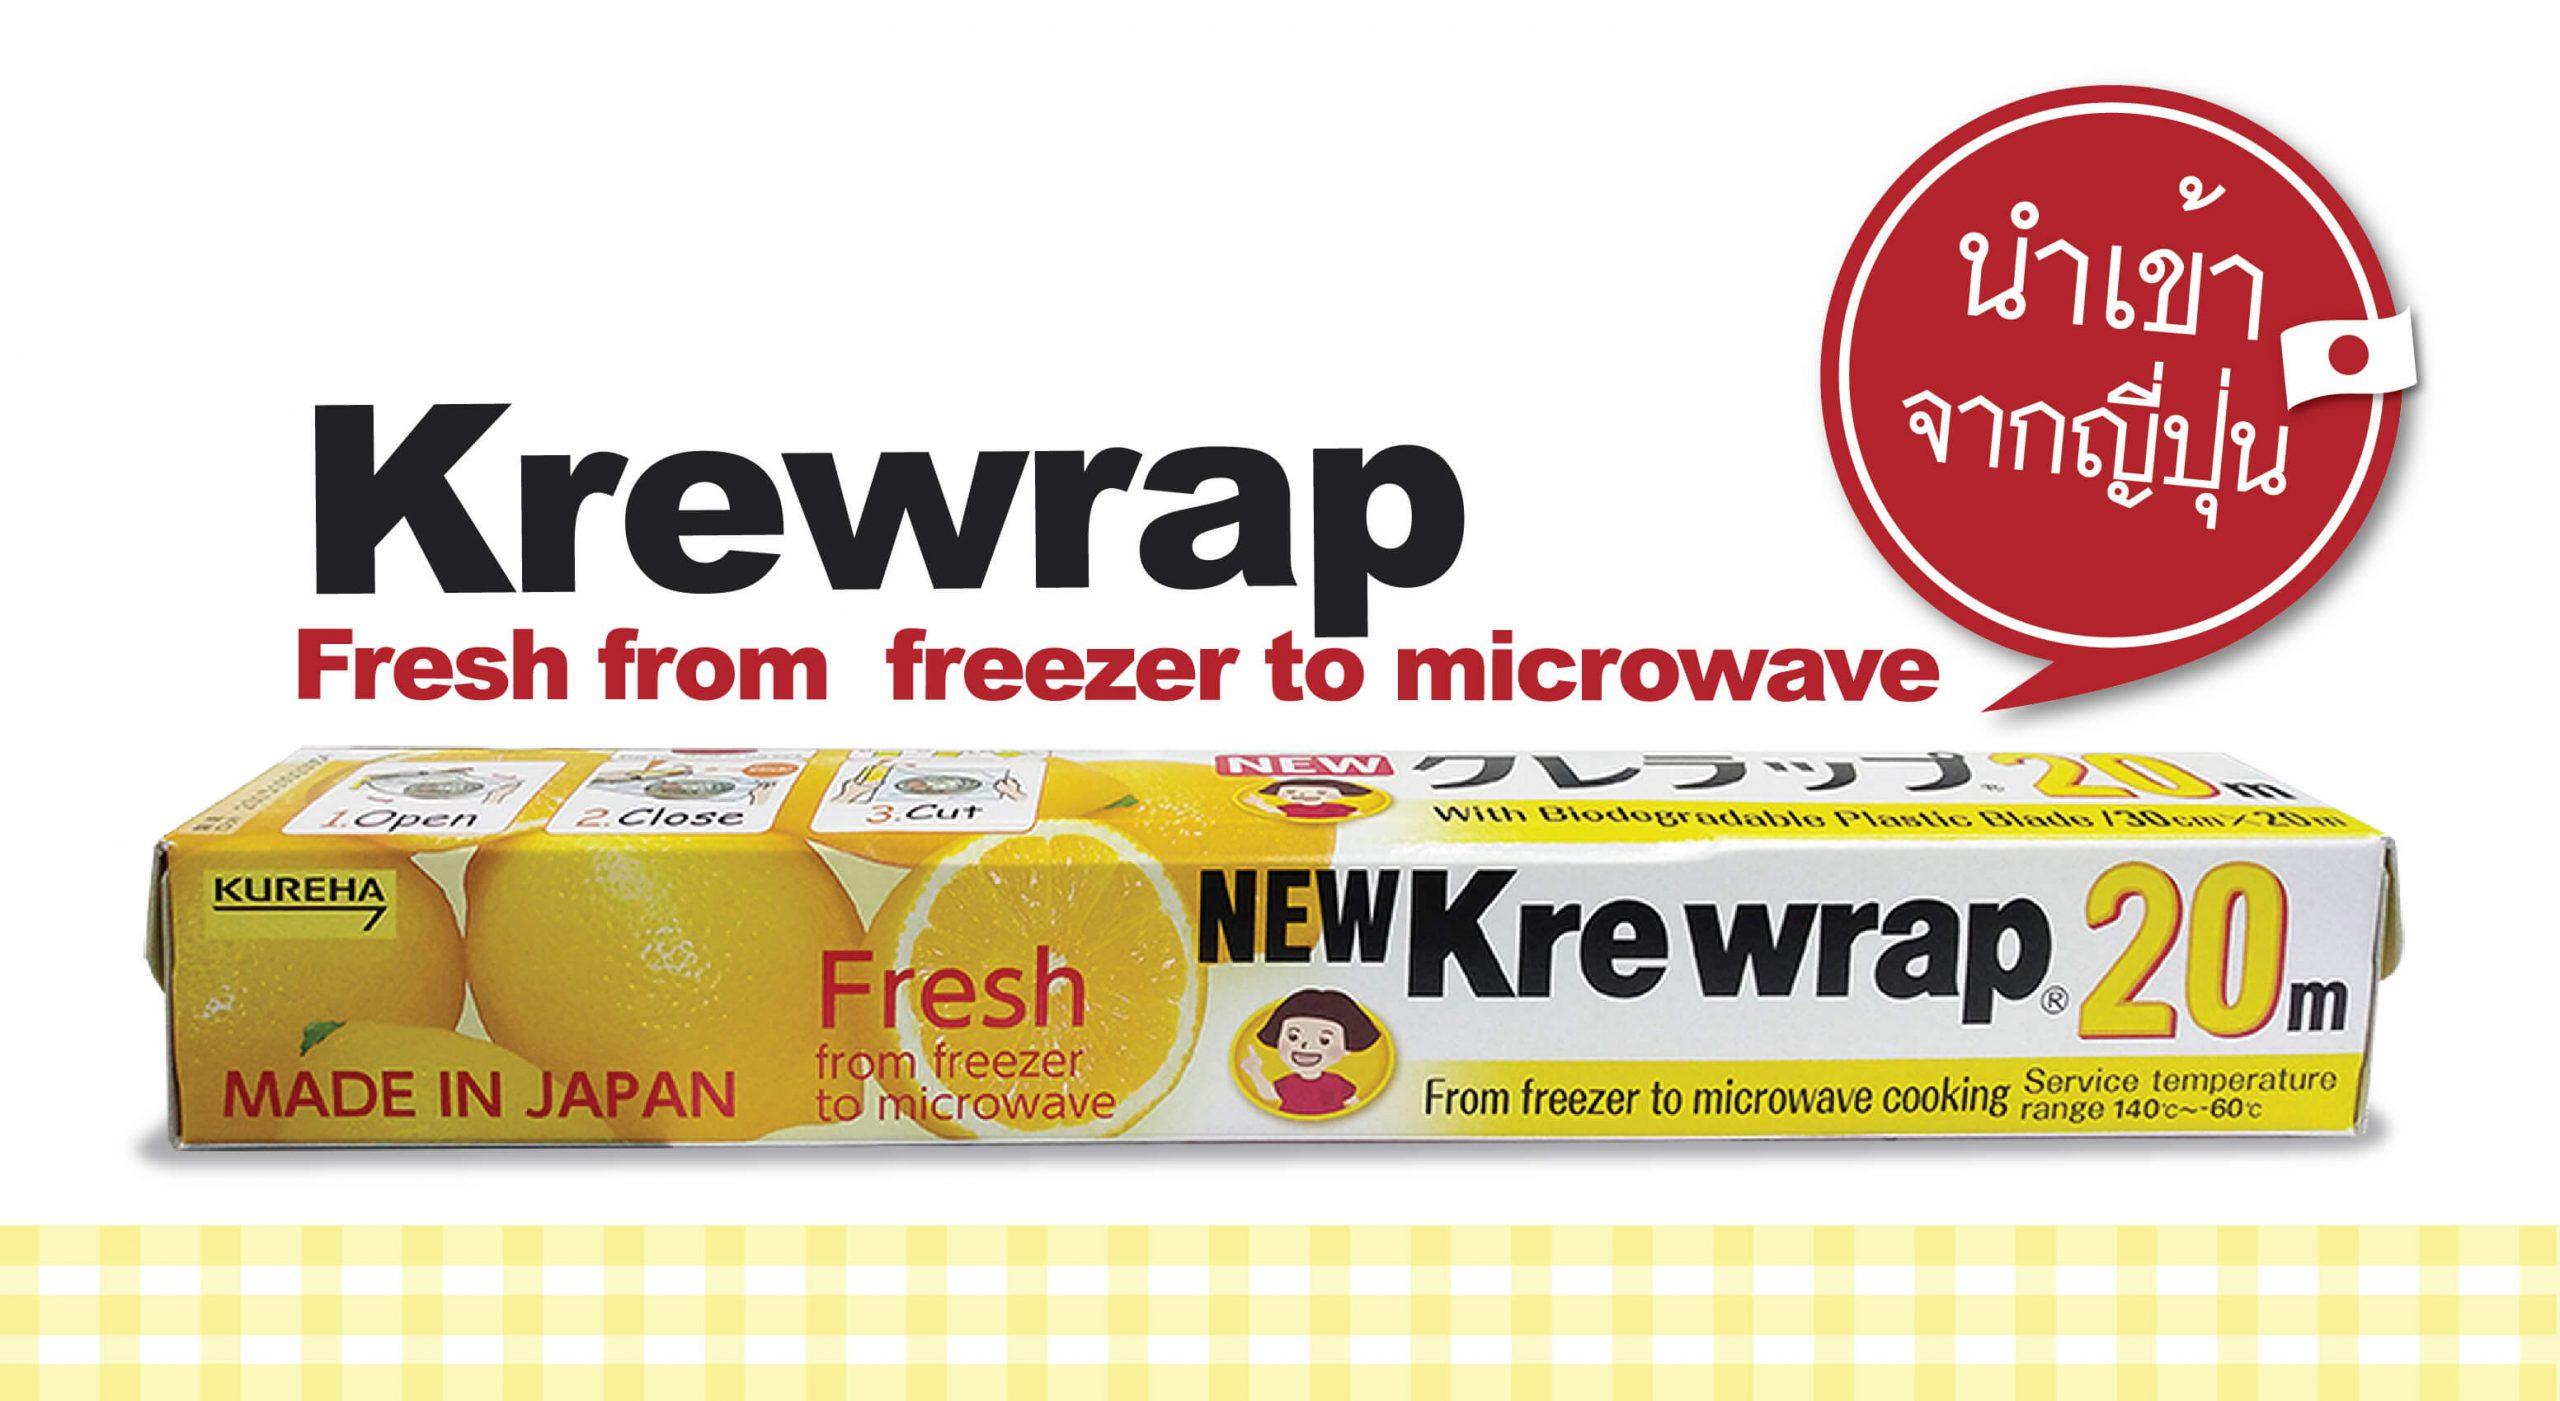 Krewrap ฟิล์มยืดห่อหุ้มอาหาร (20 เมตร)